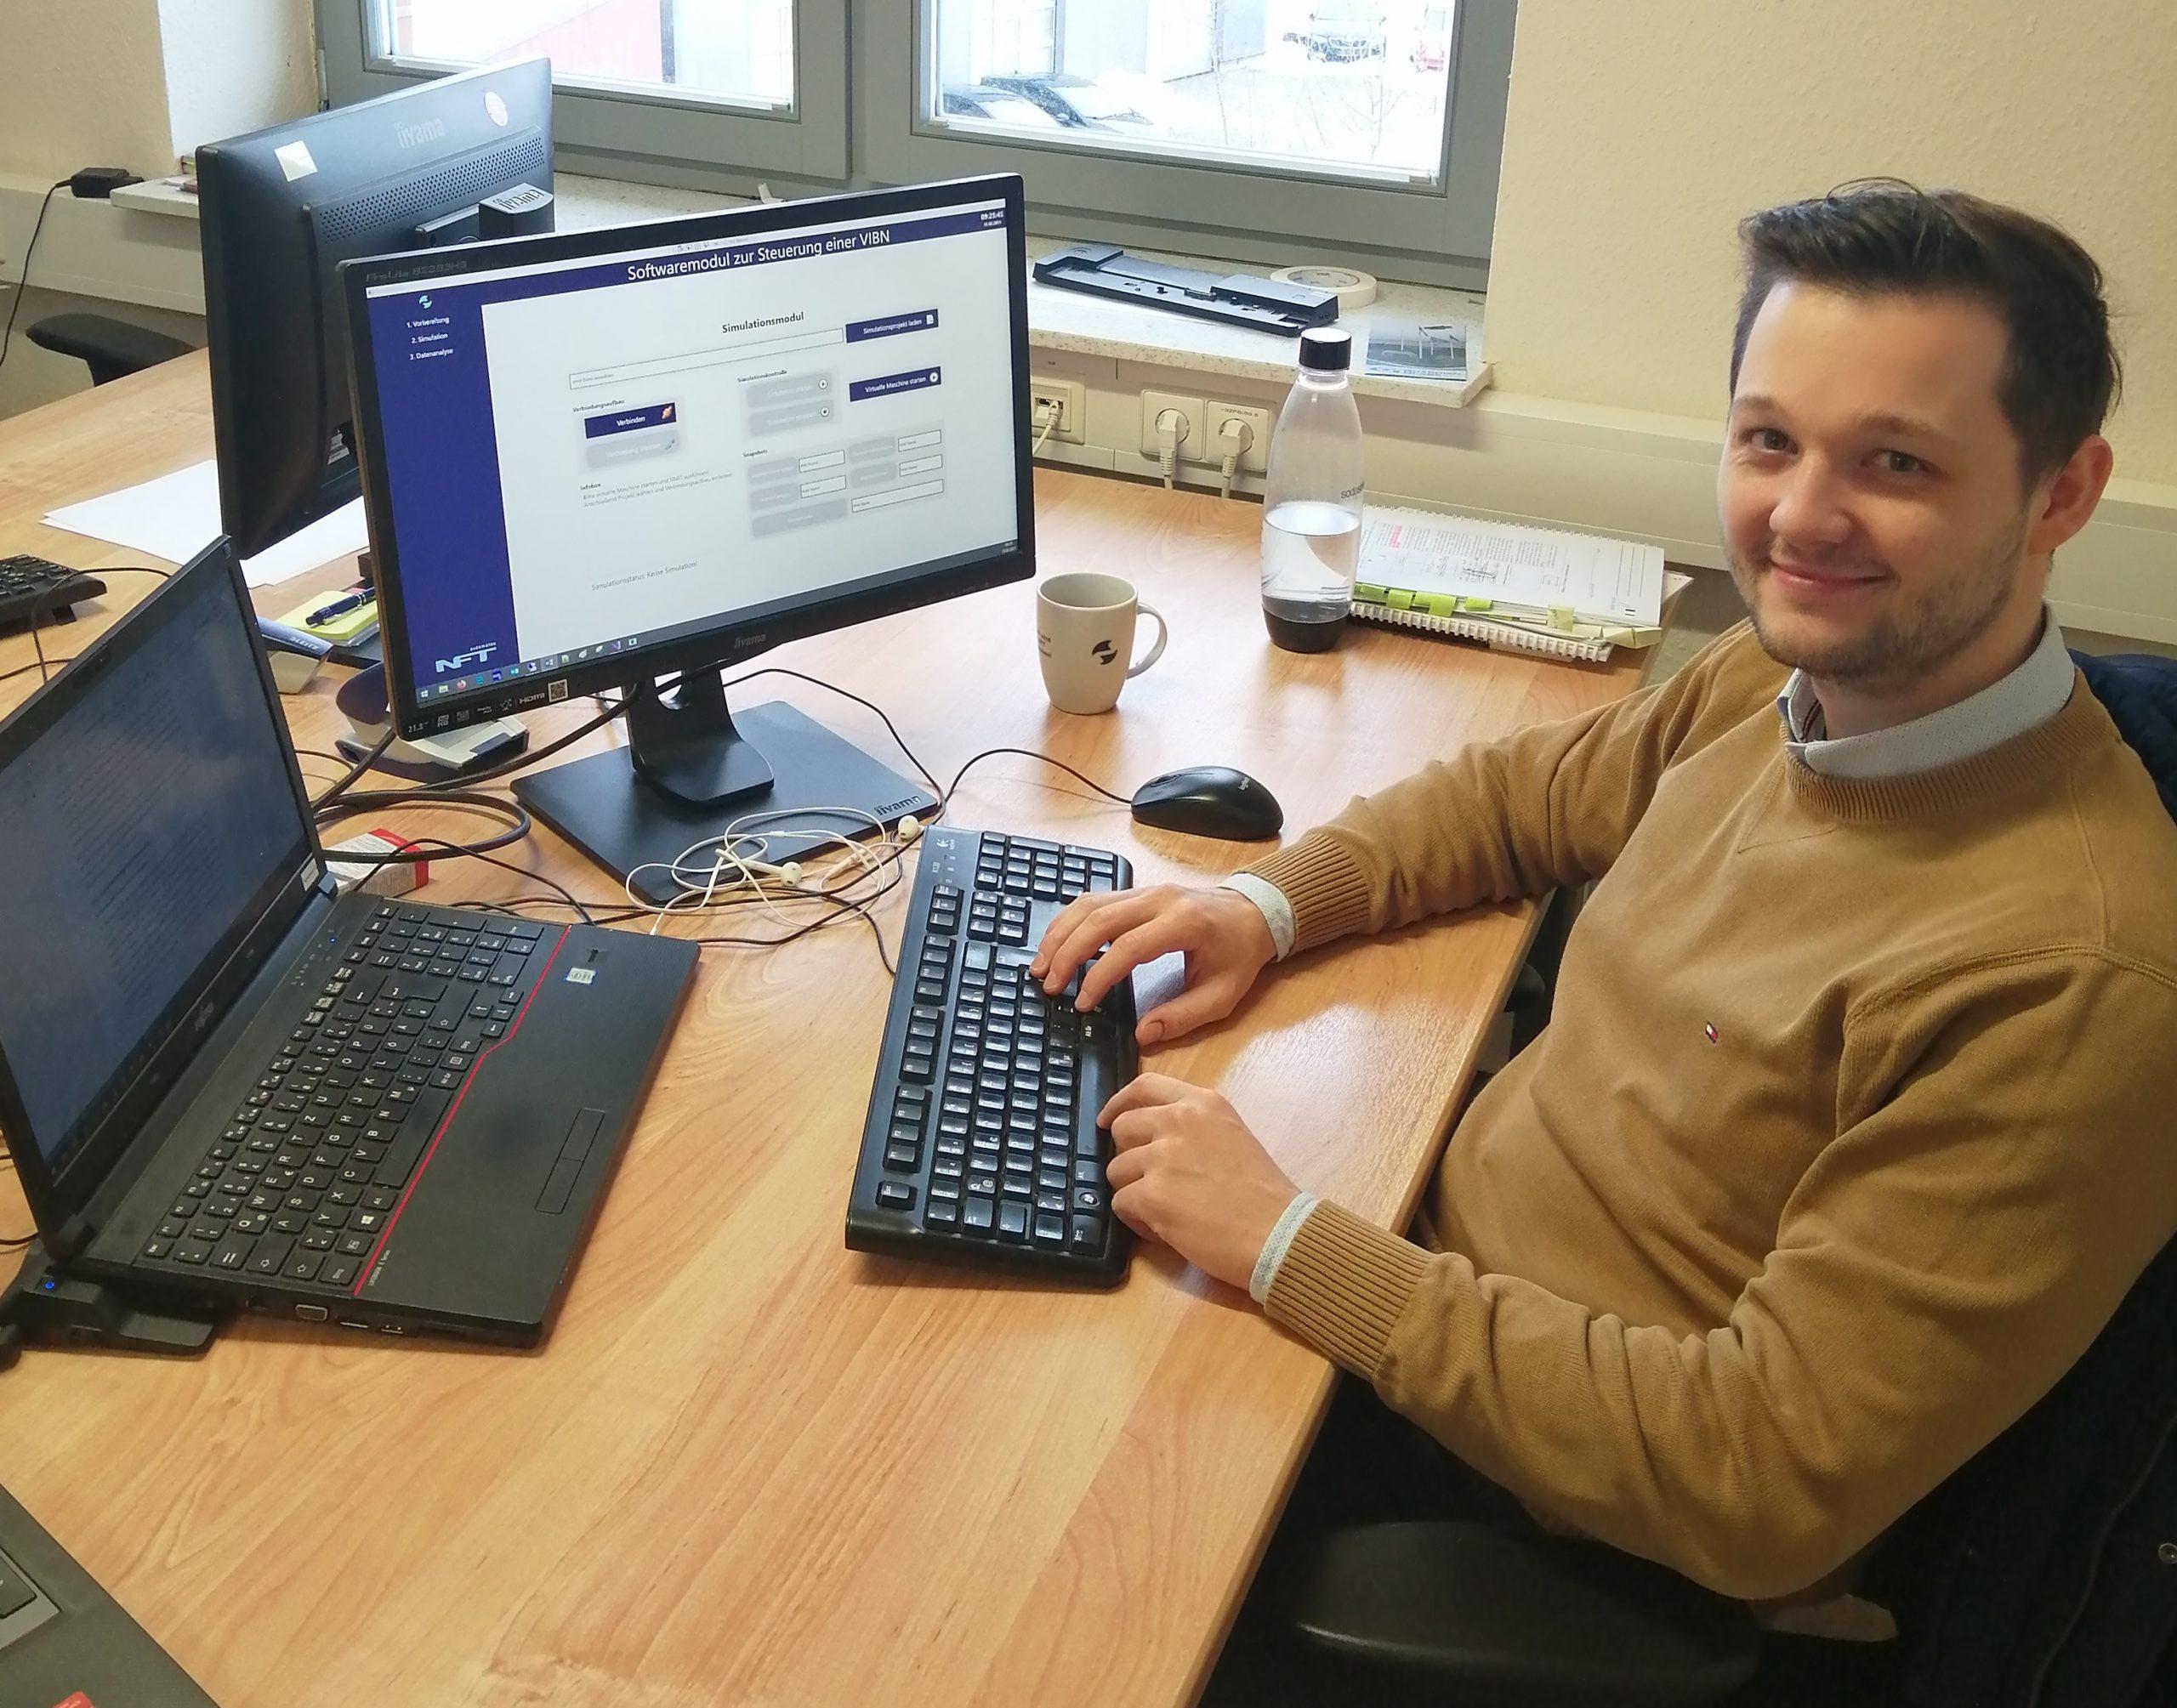 Bachelorand Alexander - AutomationML - virtuelle Inbetriebnahme